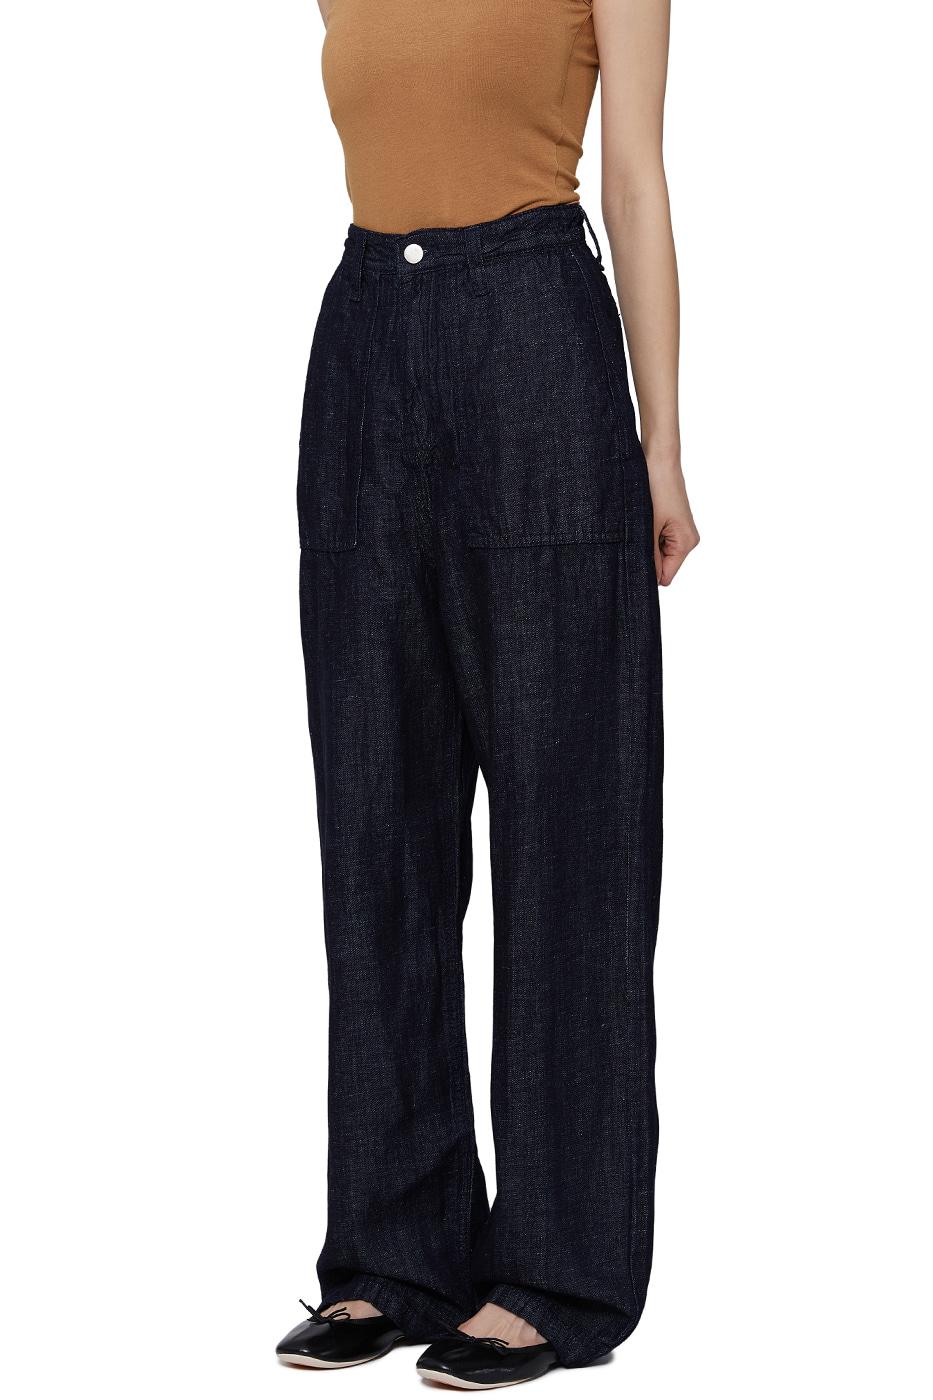 Fold Raw Pocket Wide Jeans